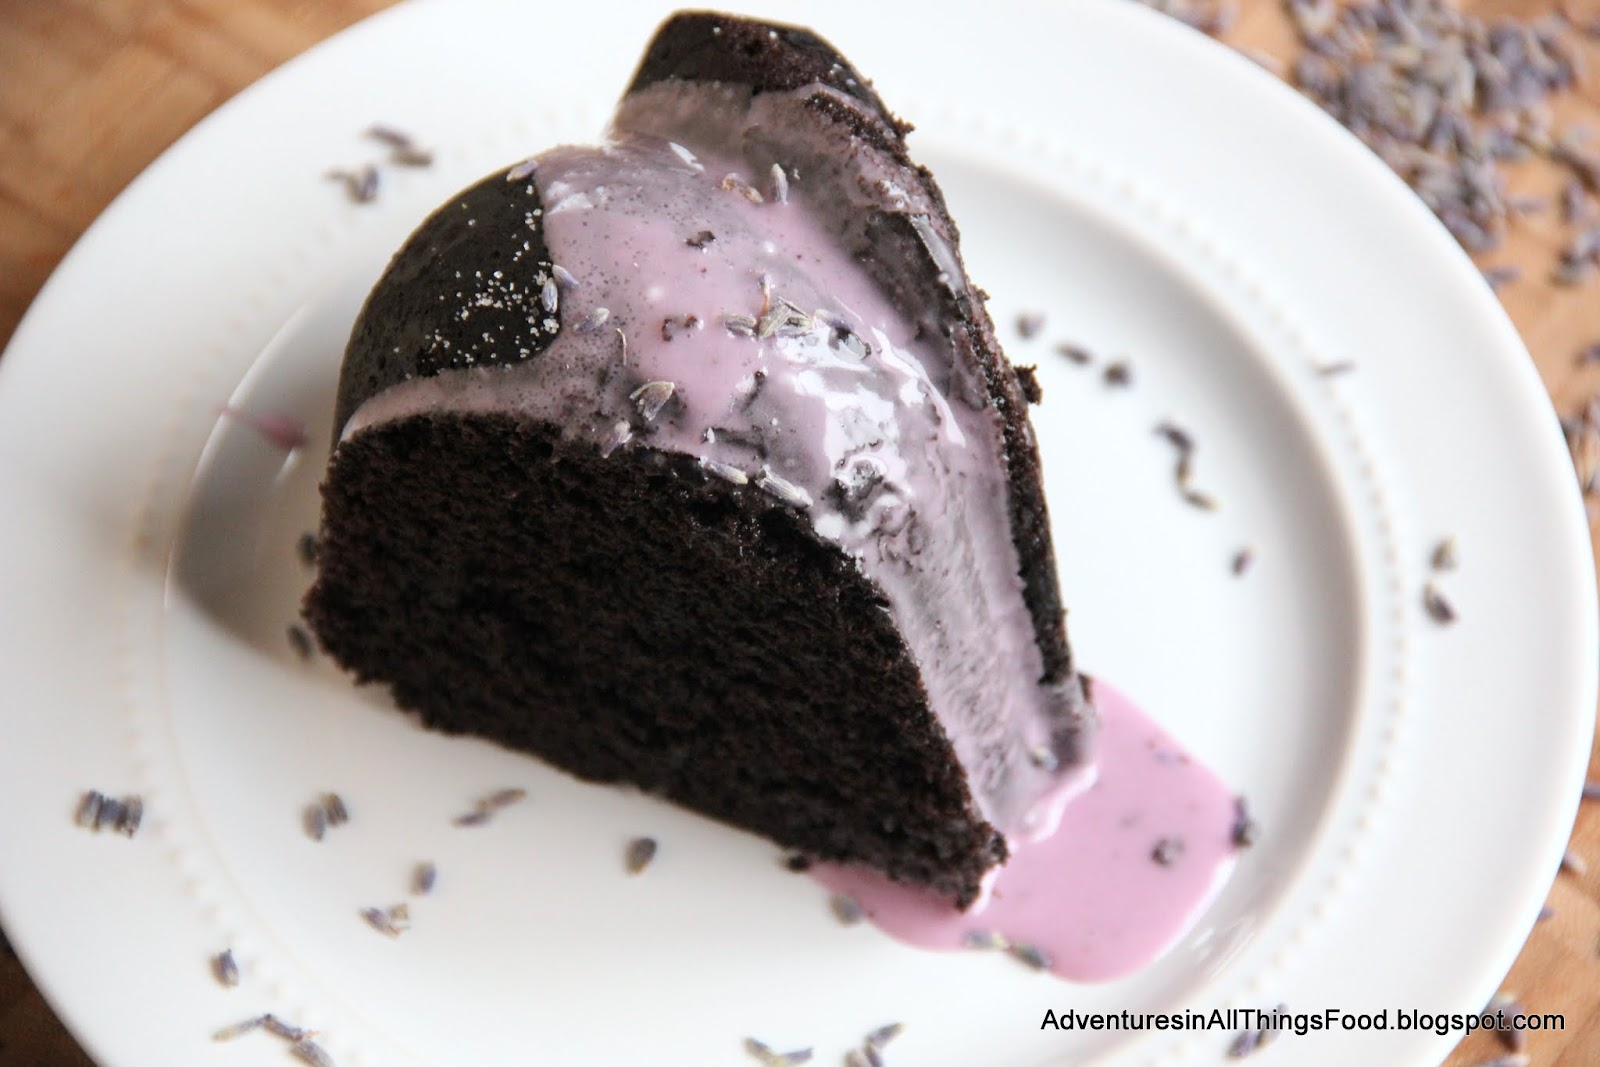 Adventures in all things food: Hot Chocolate Lavender Bundt Cake ...